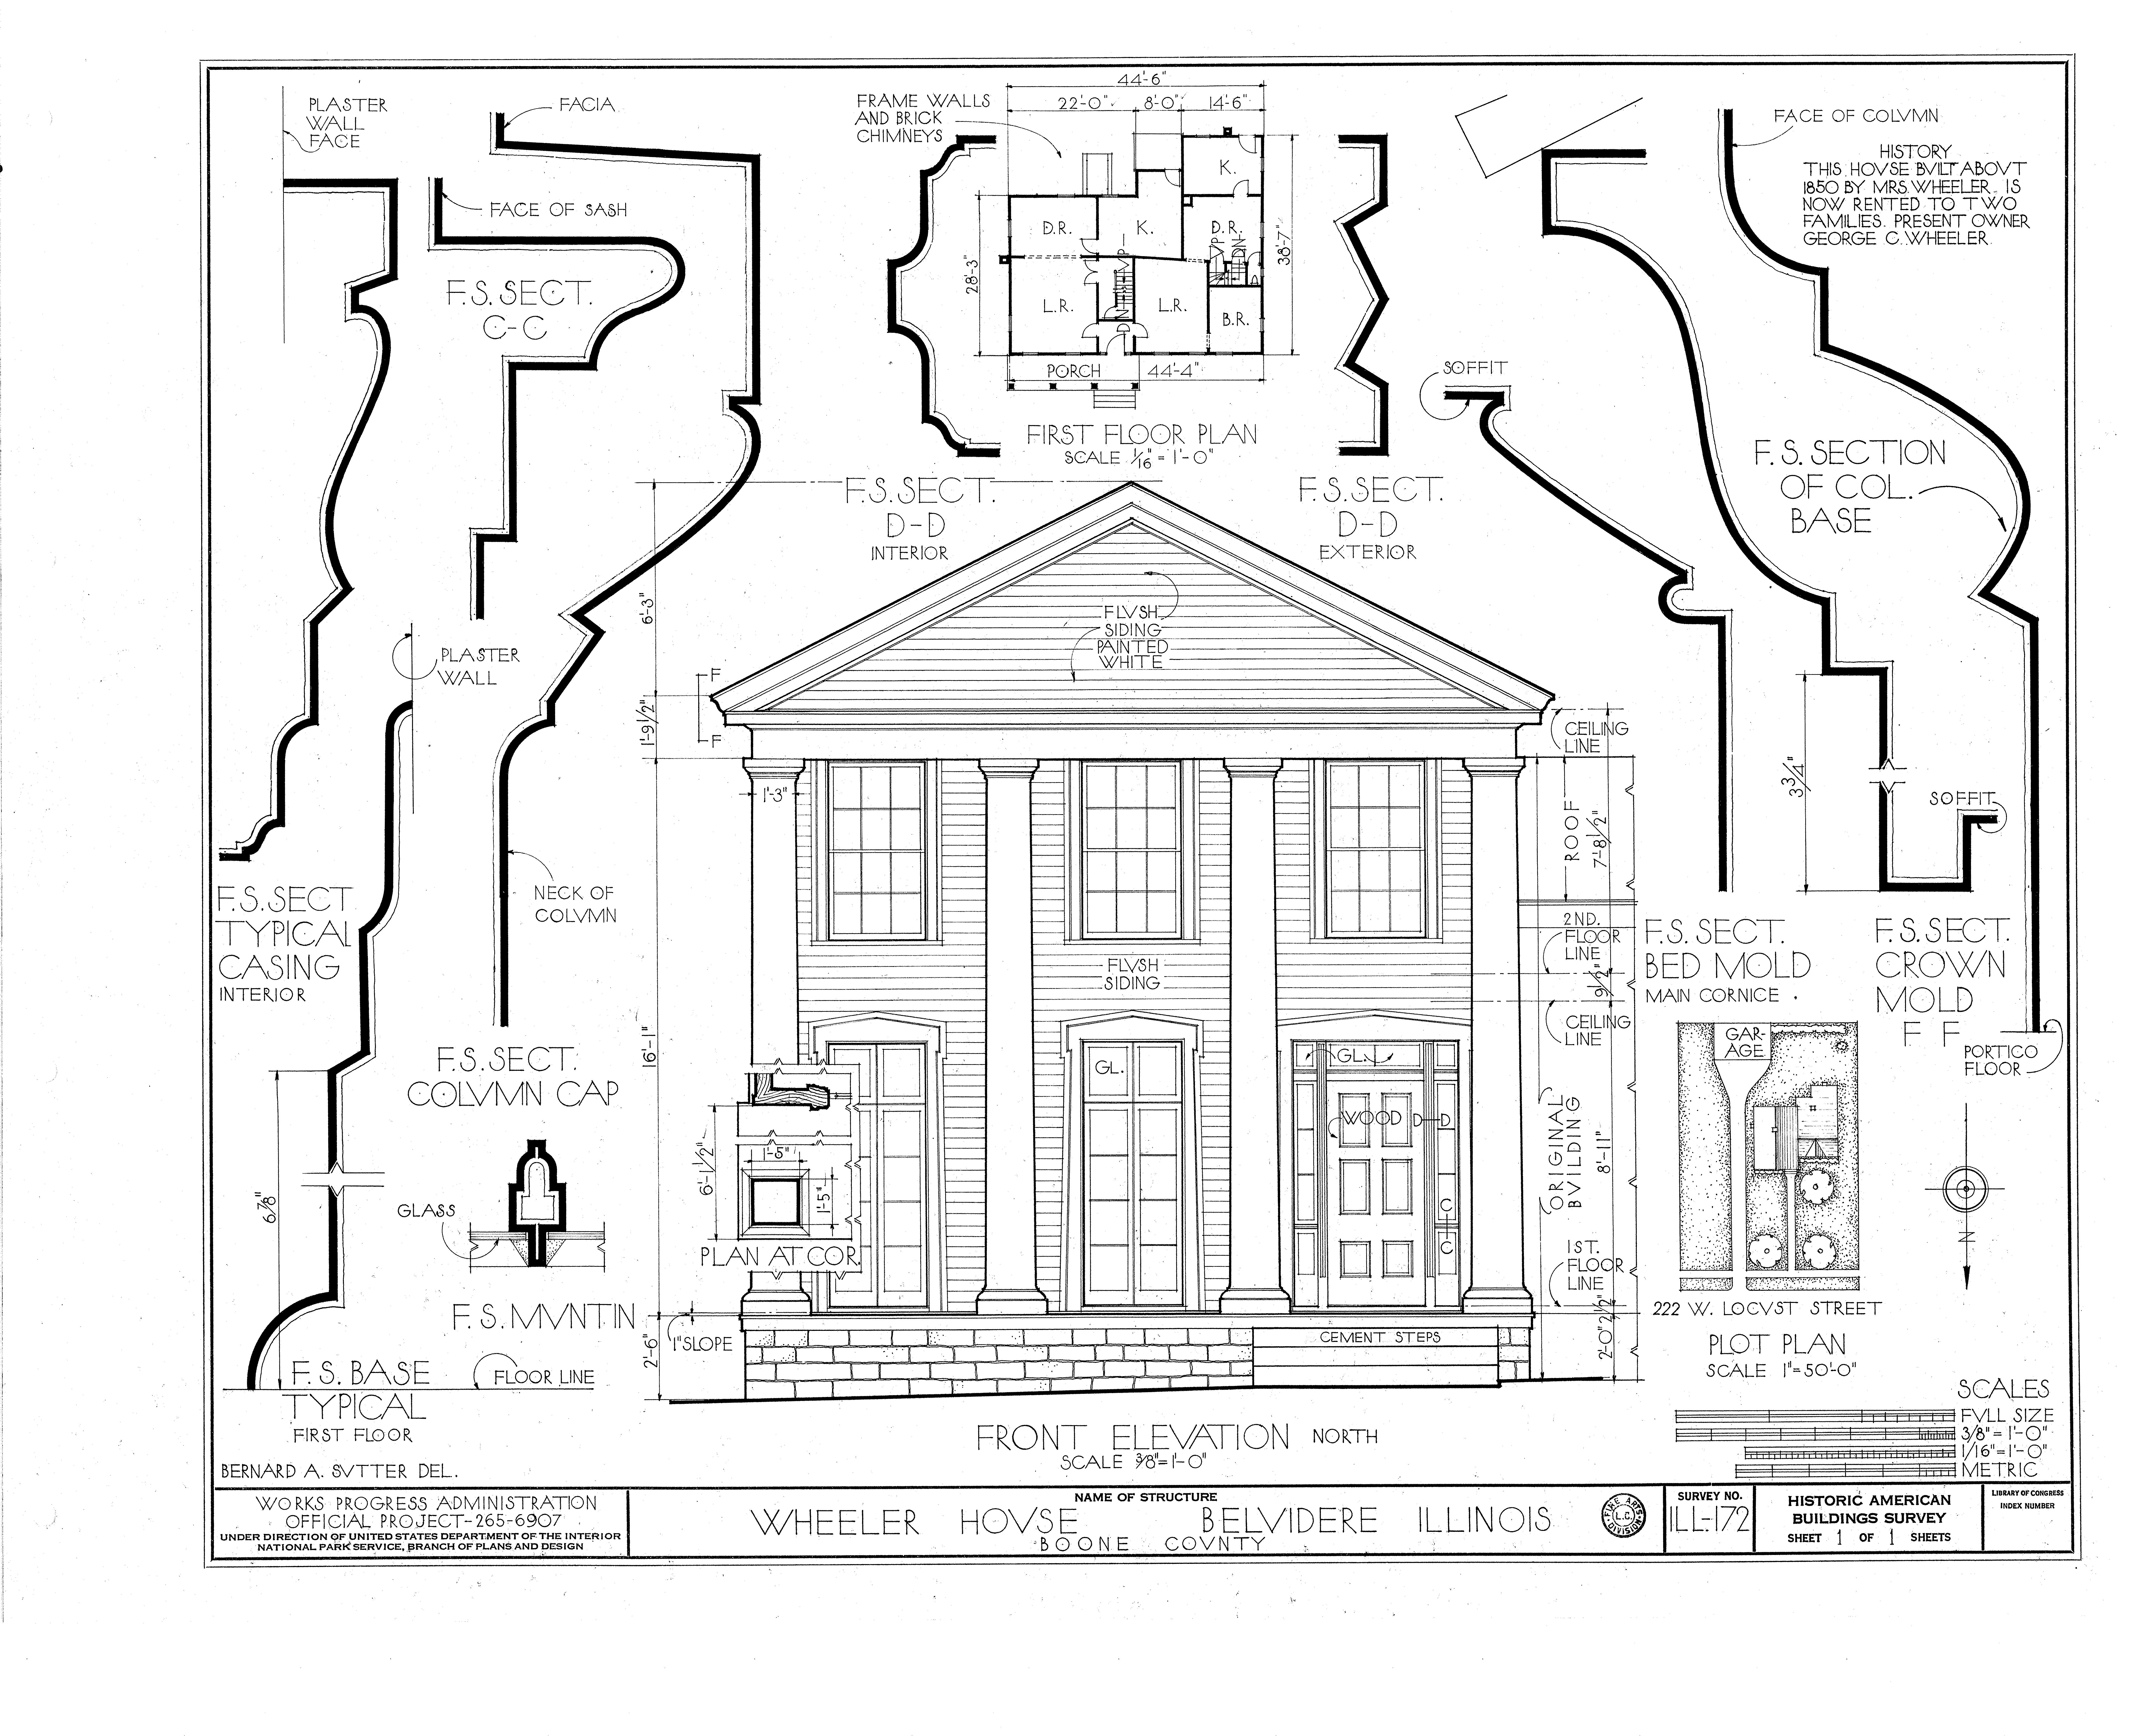 Illinois boone county belvidere - File Wheeler House 222 West Locust Street Belvidere Boone County Il